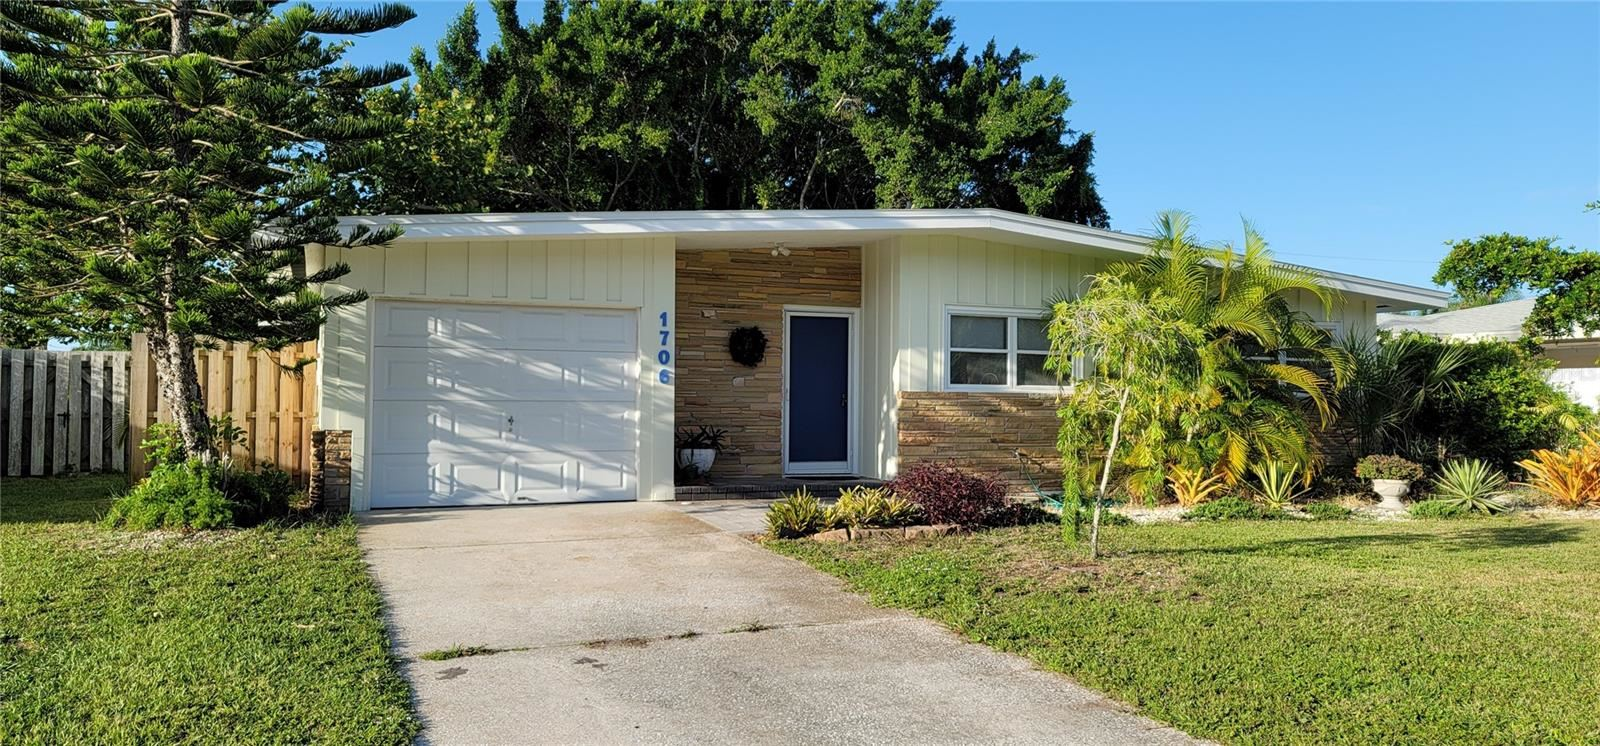 Photo of 1706 LIVINGSTONE STREET, SARASOTA, FL 34231 (MLS # A4508277)